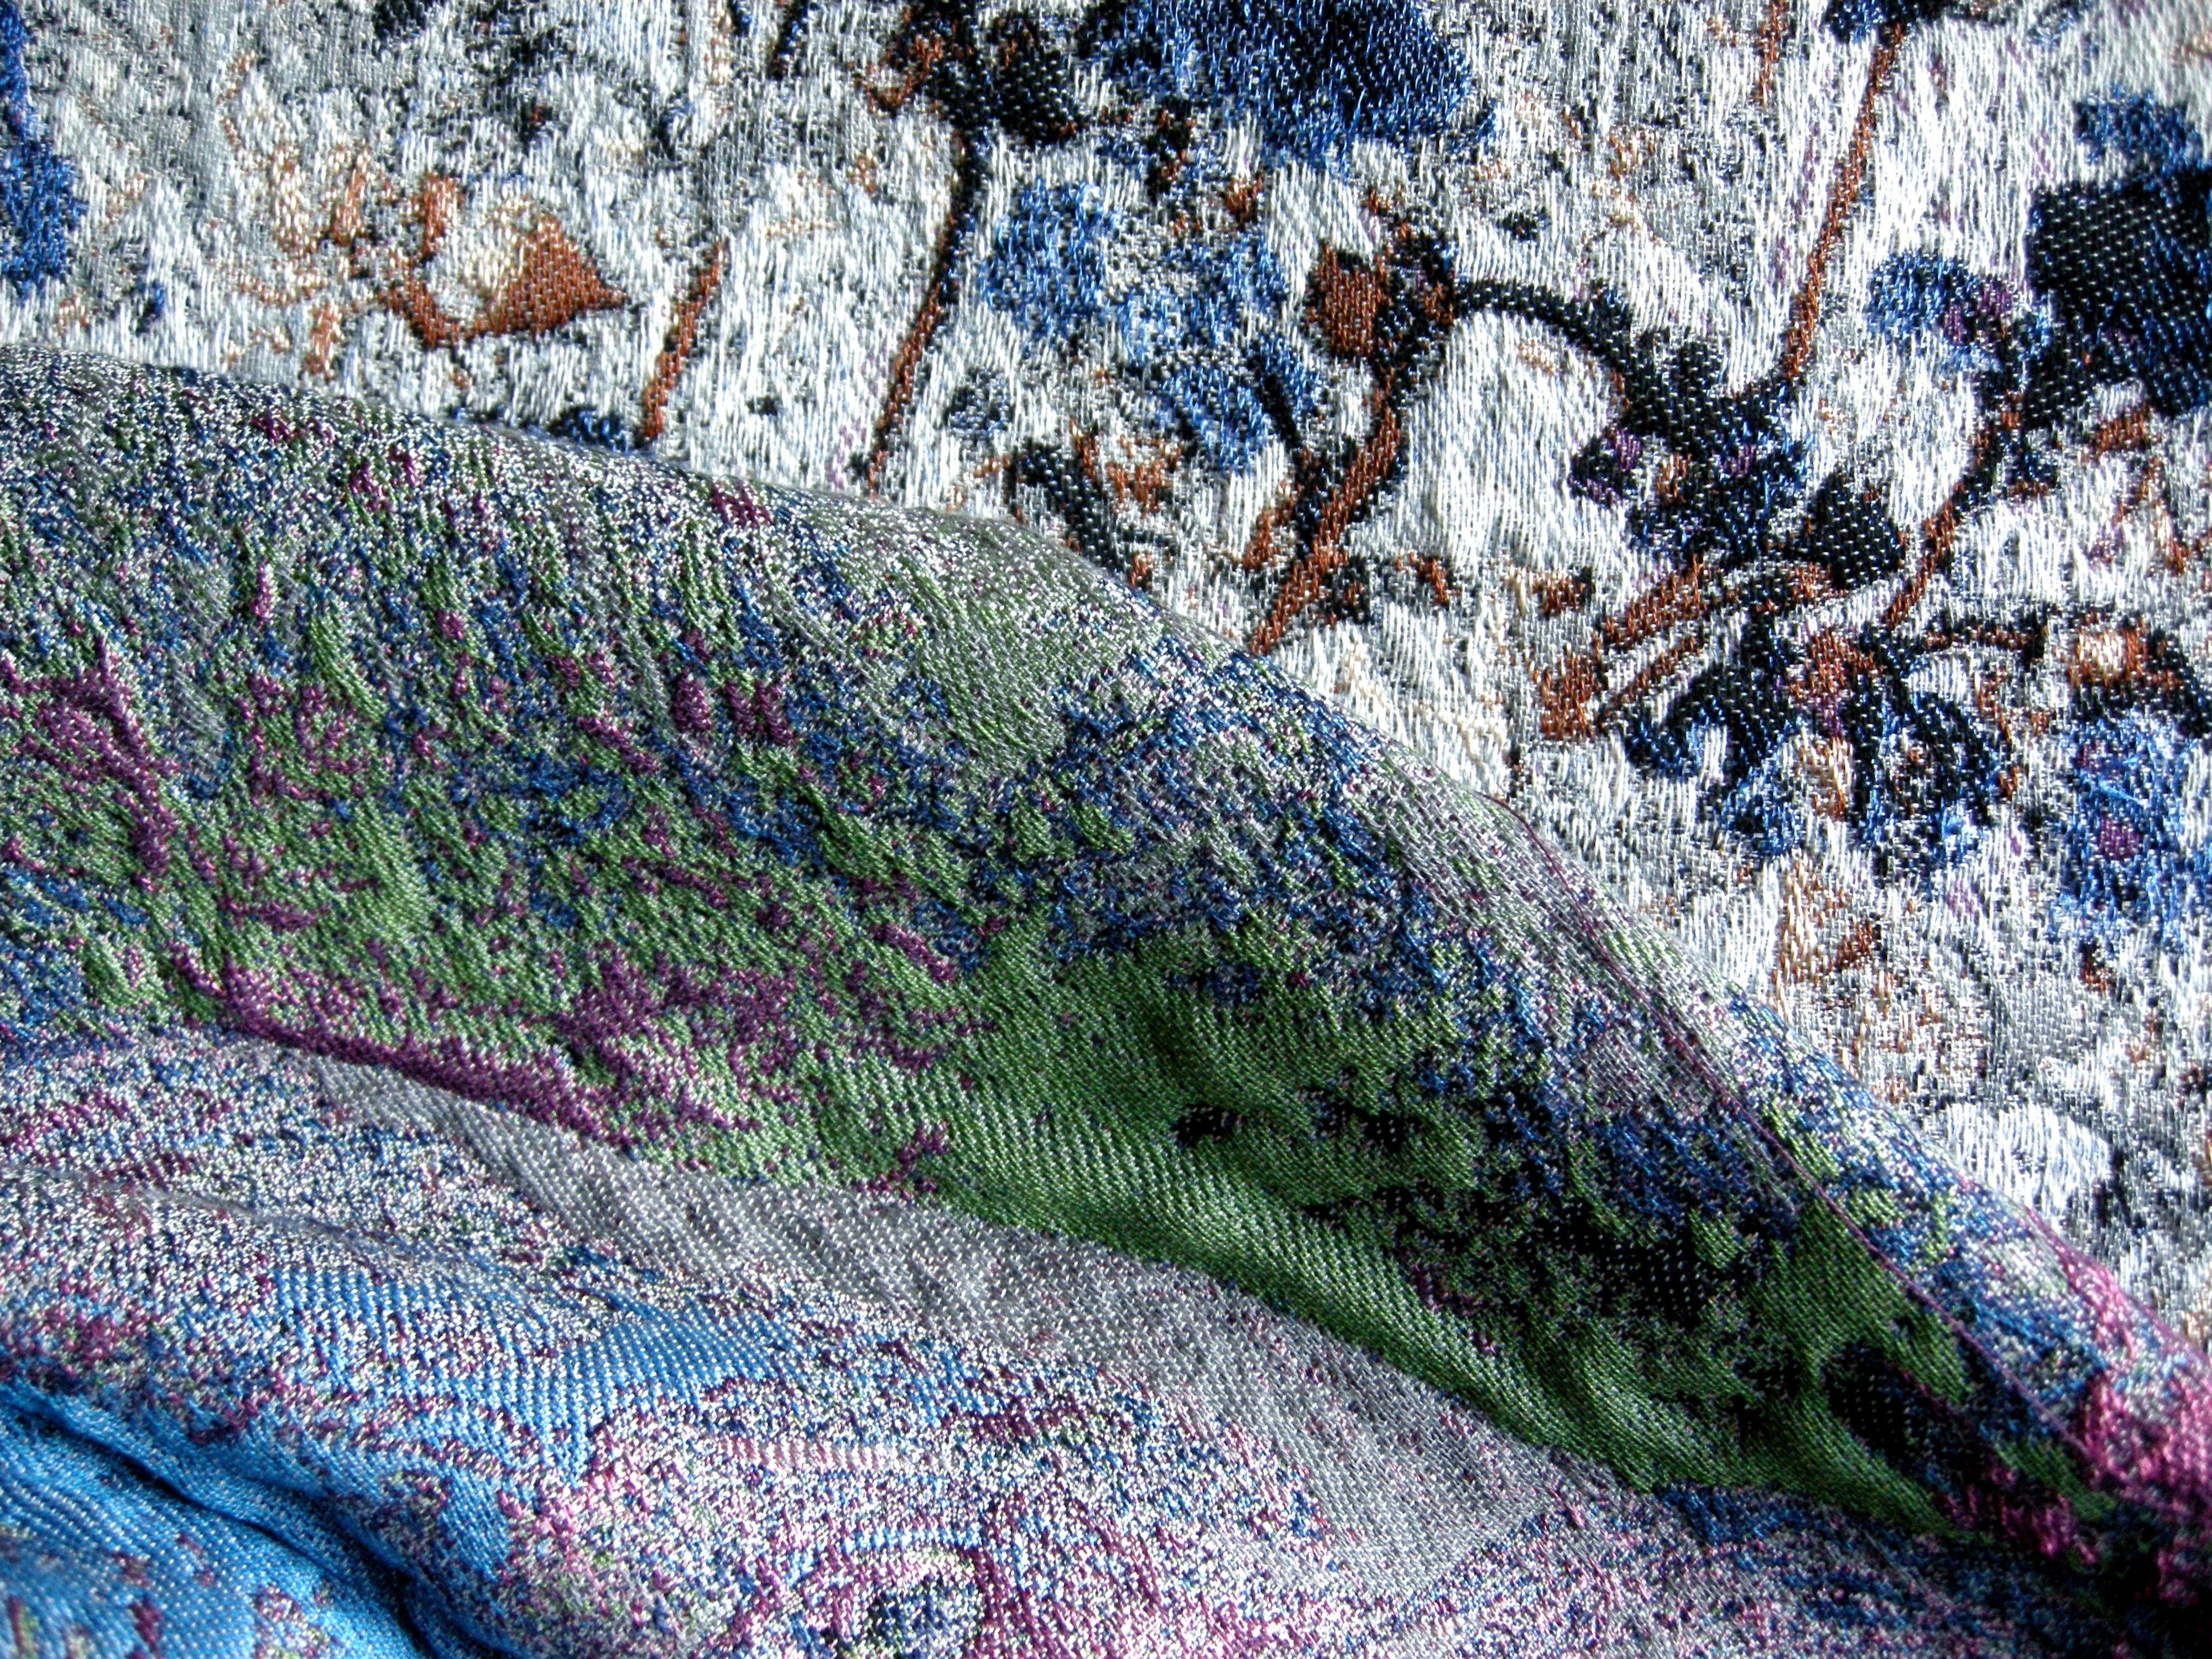 jacquard woven fabric, Woven Wonders